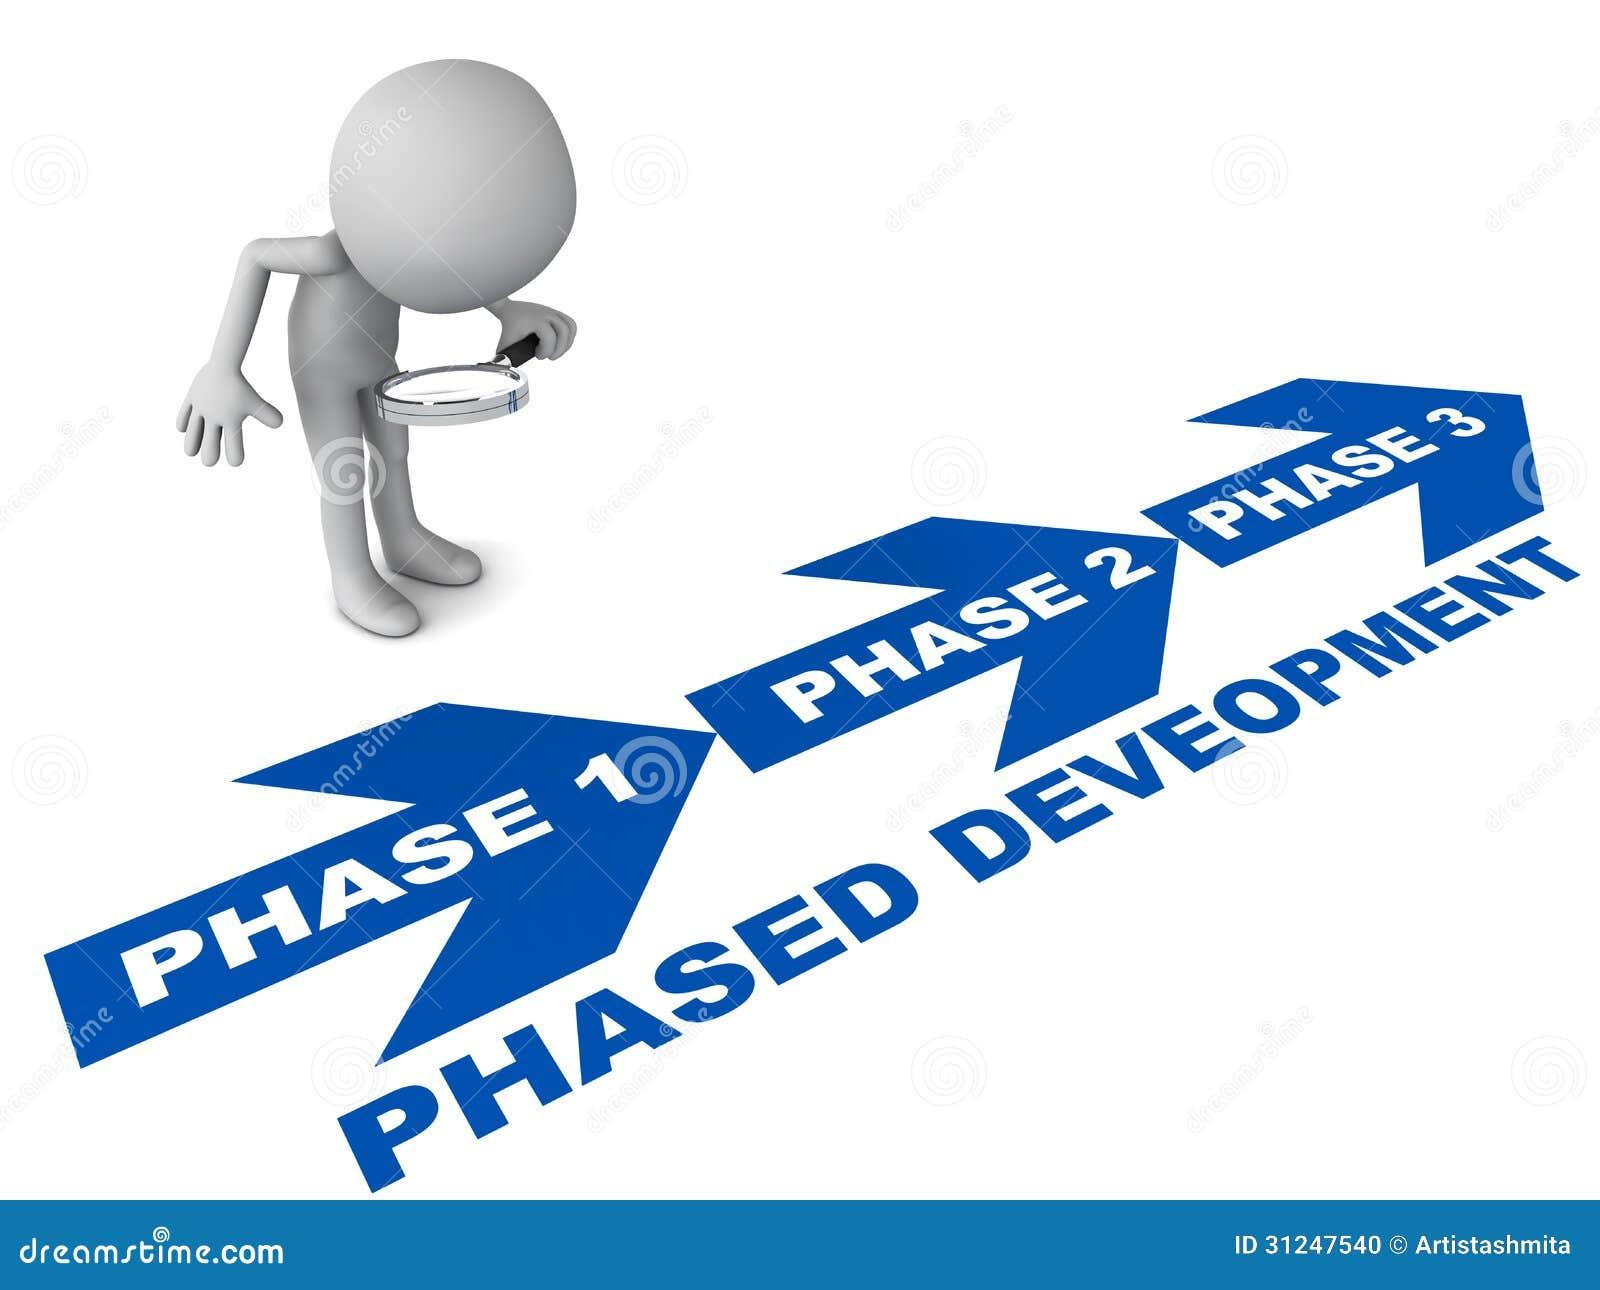 Phased Development Project Stock Illustration. Illustration Of Background